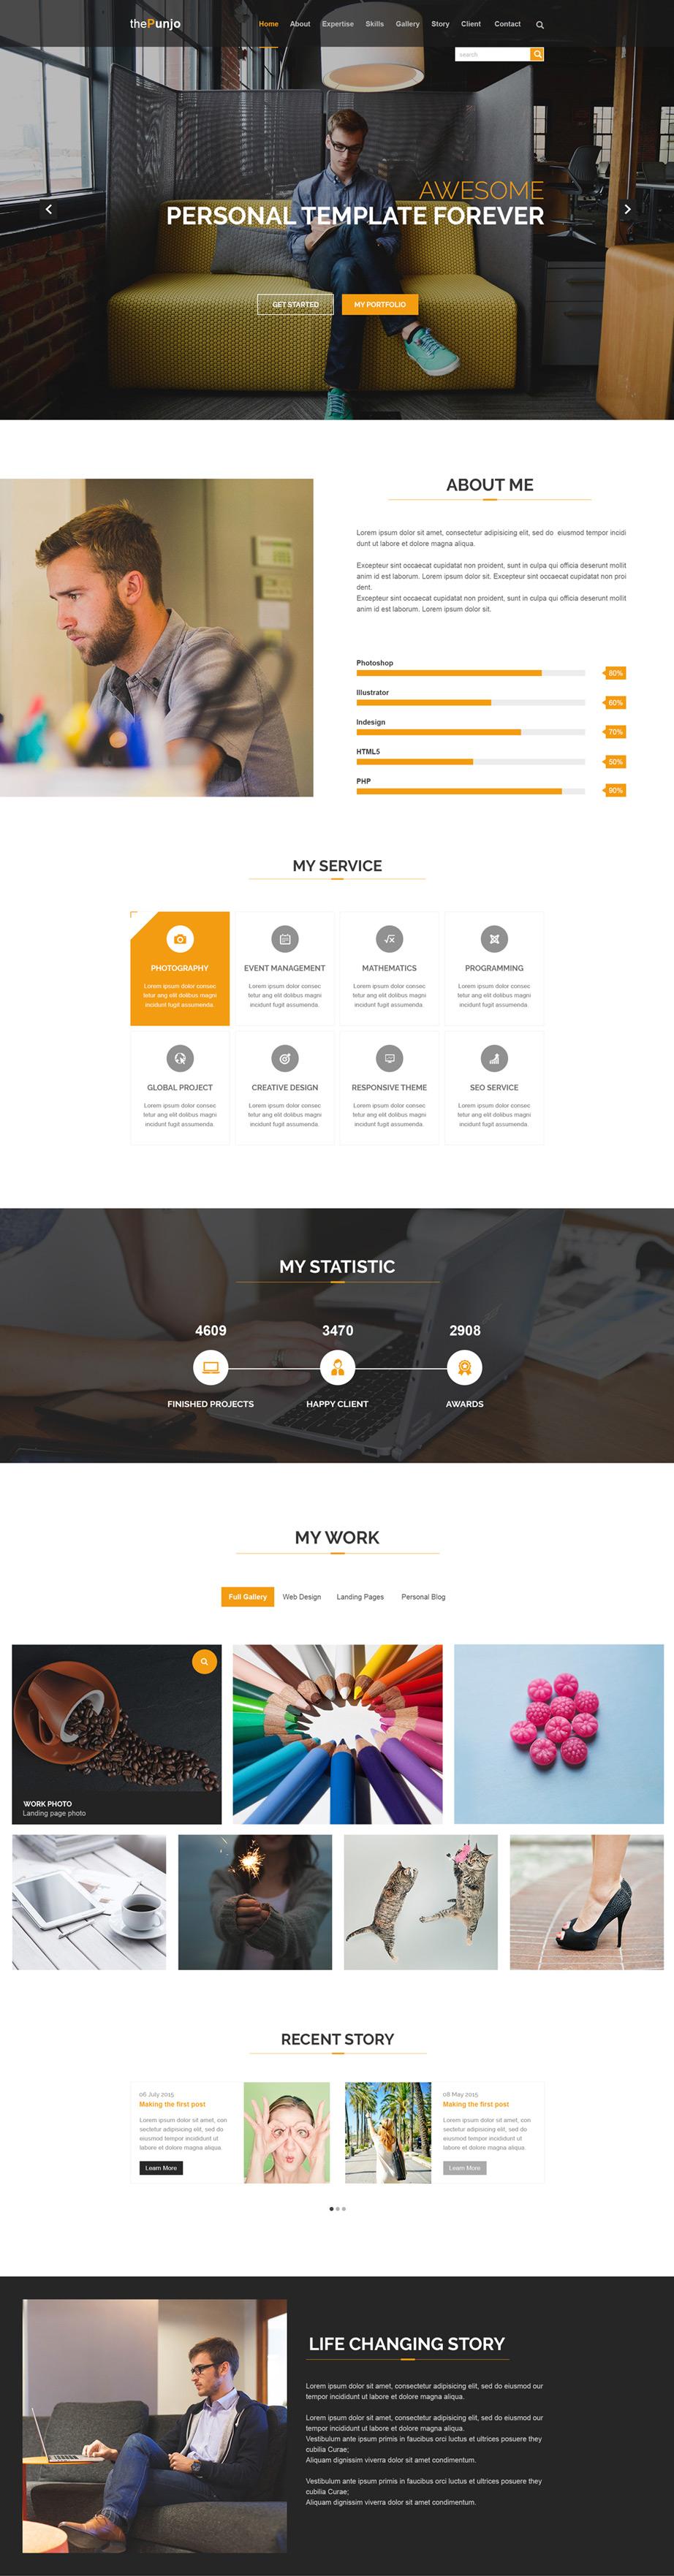 Free Portfolio Website Templates (PSD Вебдизайн, Дизайн